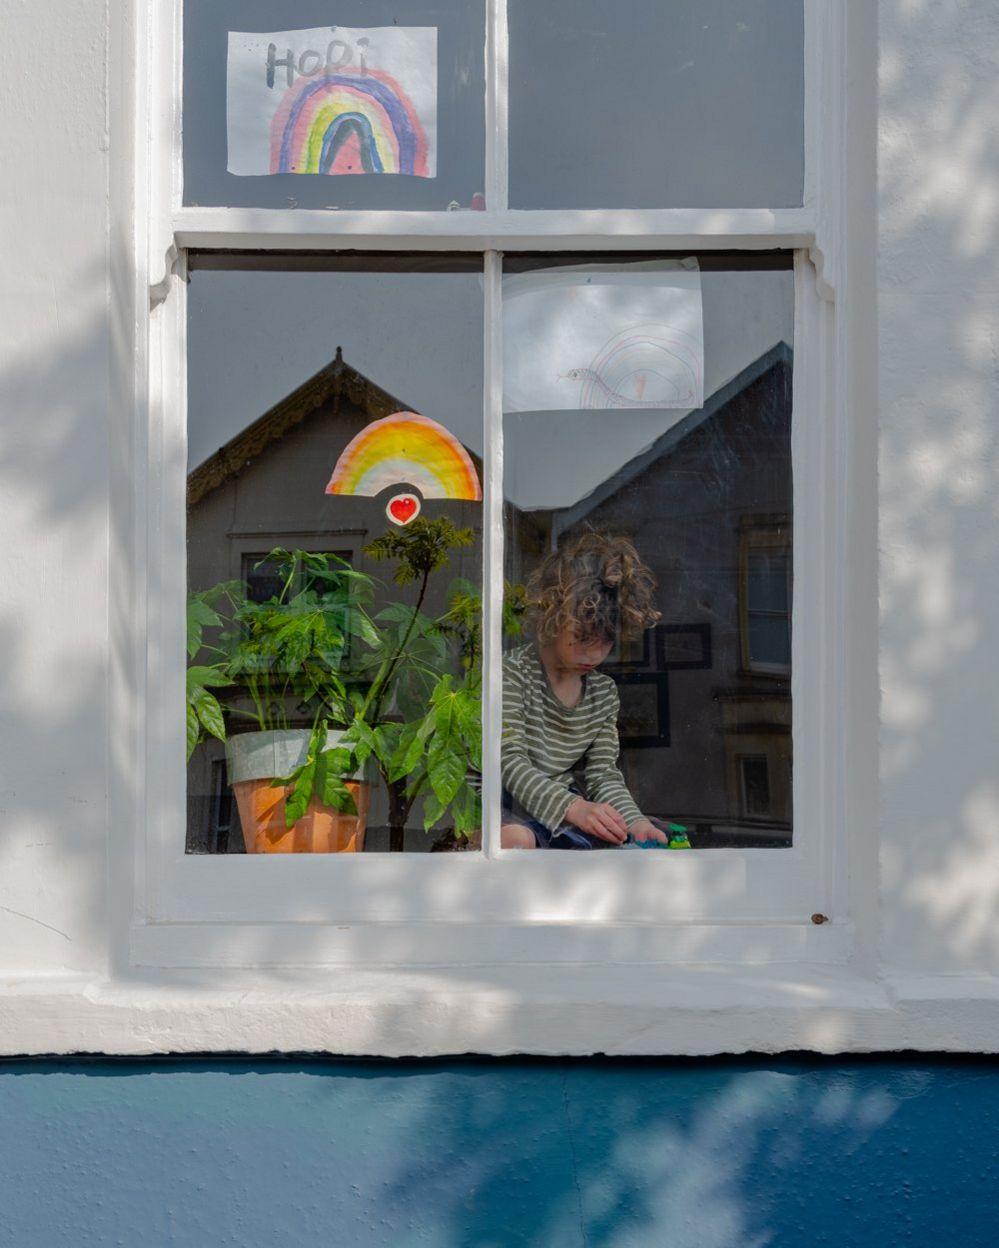 Hopi at the window